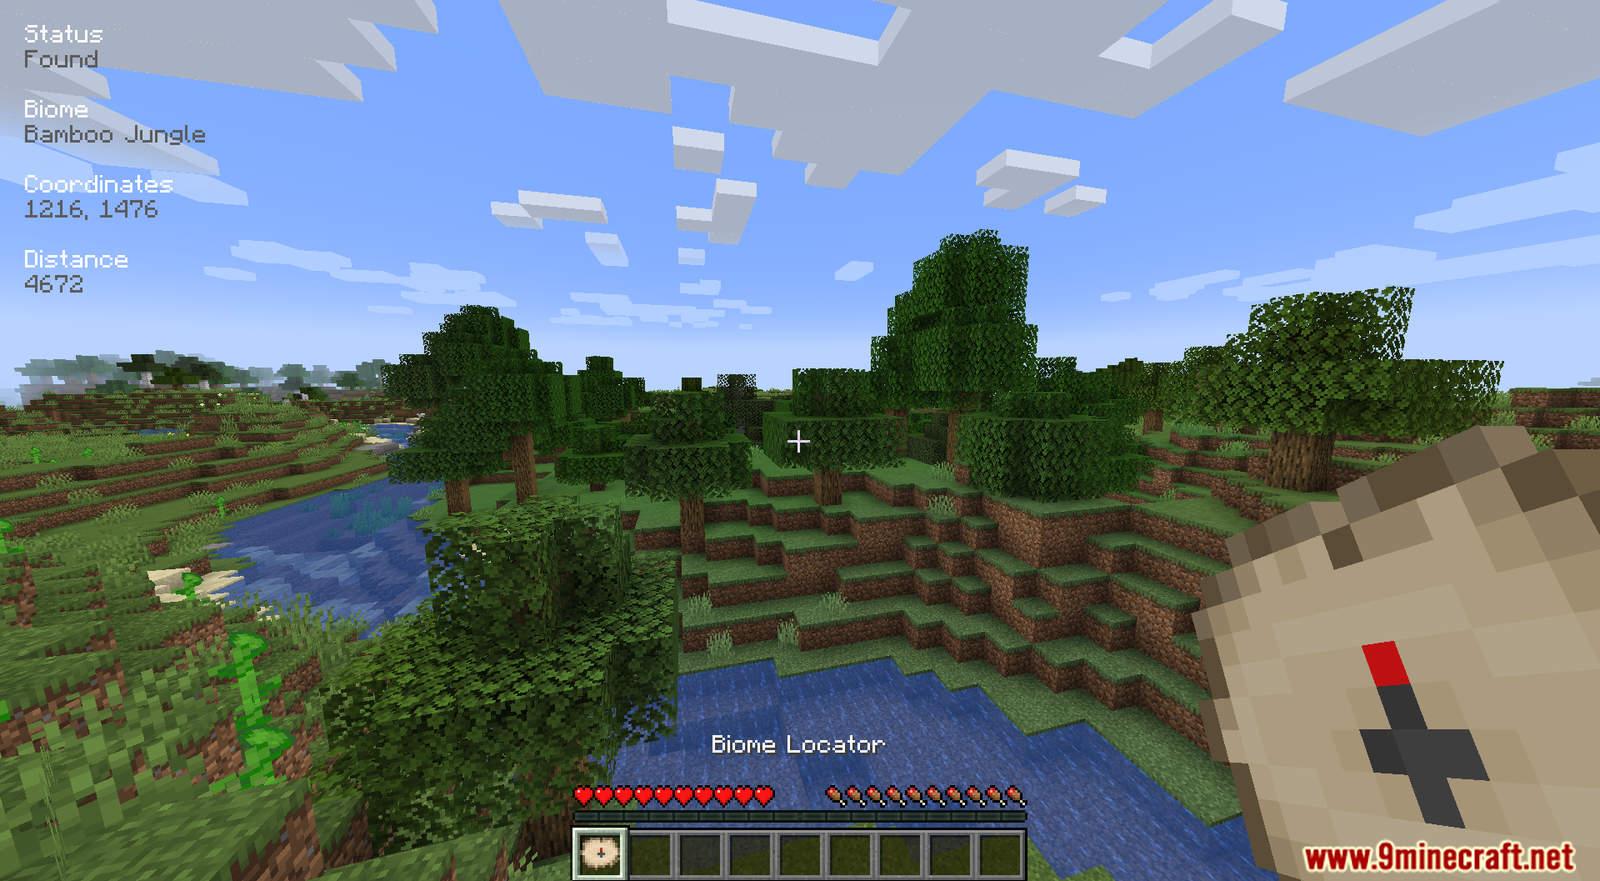 Biome Locator mod for Minecraft (11)